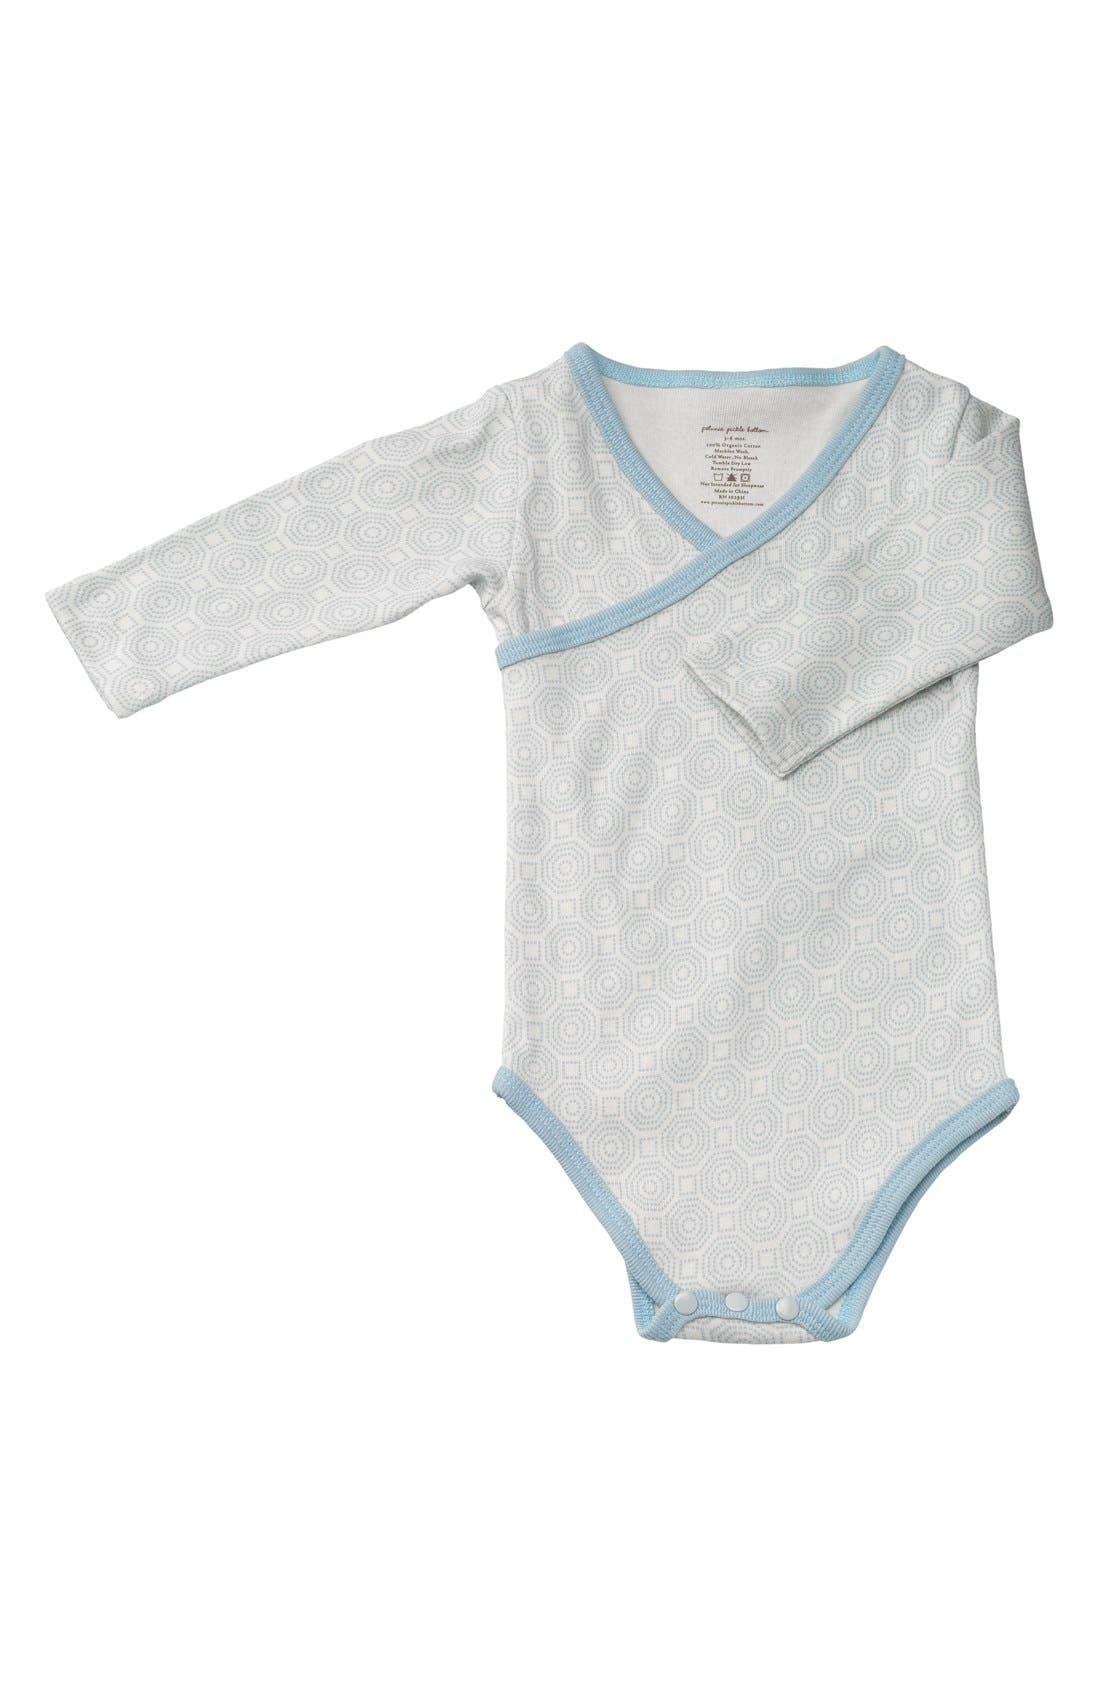 Main Image - Petunia Pickle Bottom Organic Cotton Long Sleeve Bodysuit (Baby)